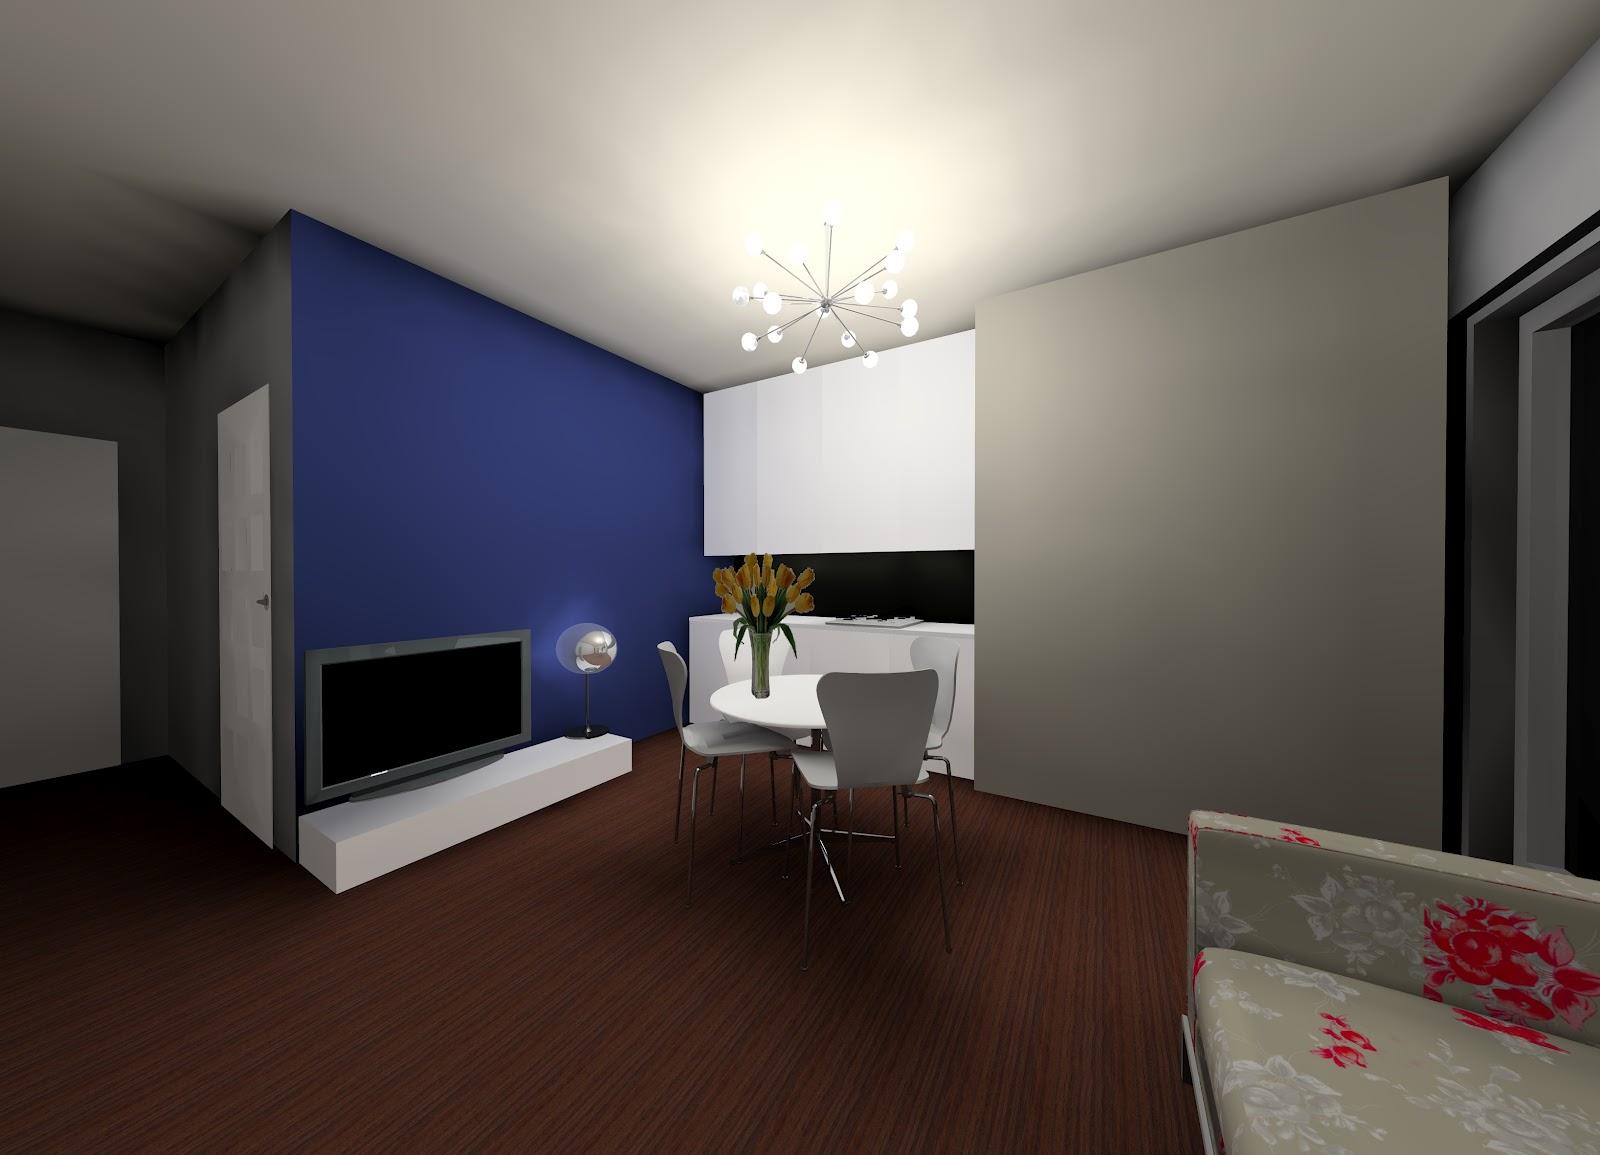 Emejing Cucina Soggiorno 20 Mq Photos - Home Interior Ideas - hollerbach.us